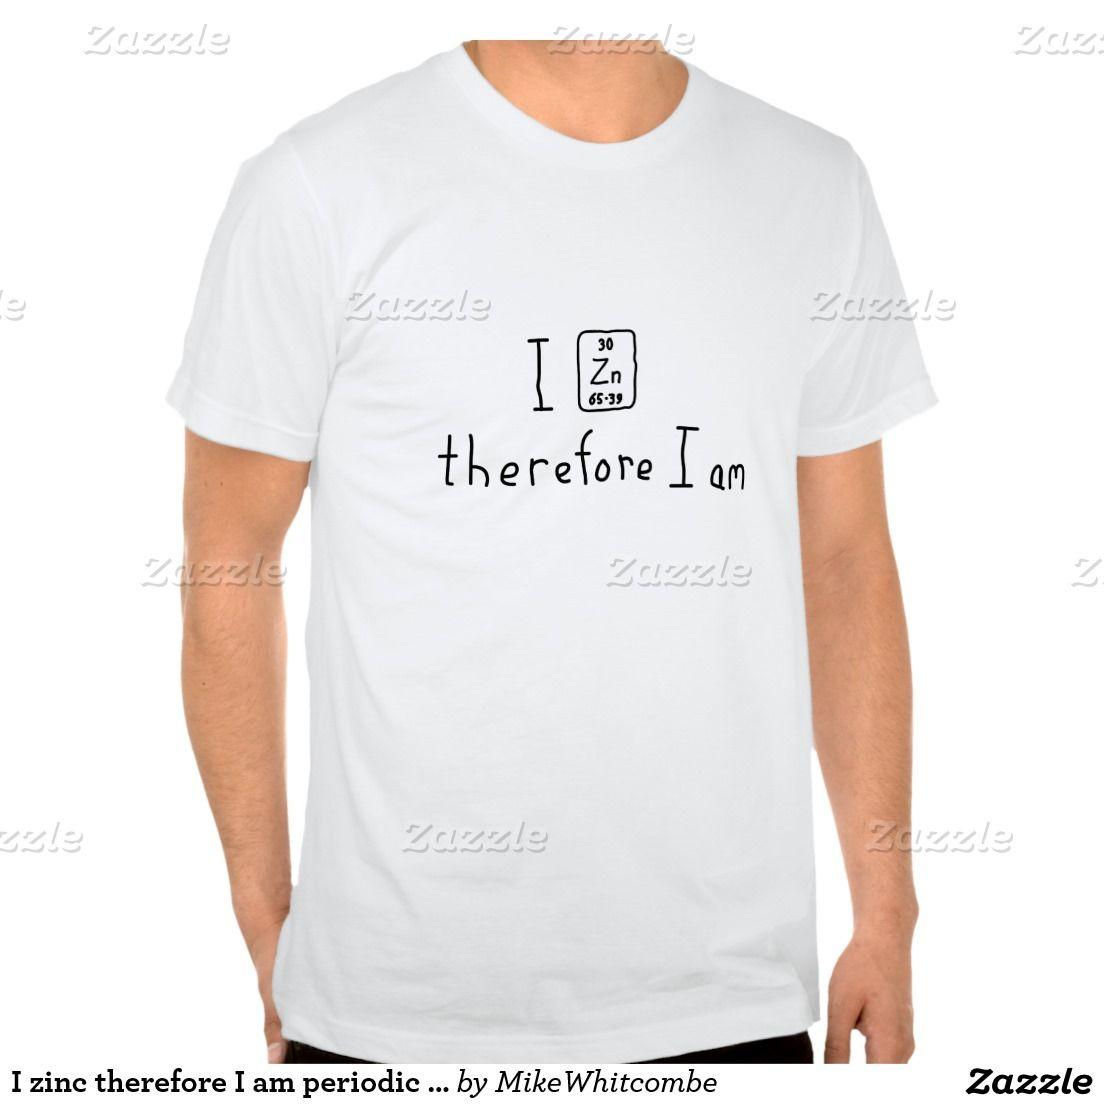 I zinc therefore i am periodic table pun shirt clothes i love i zinc therefore i am periodic table pun shirt urtaz Gallery